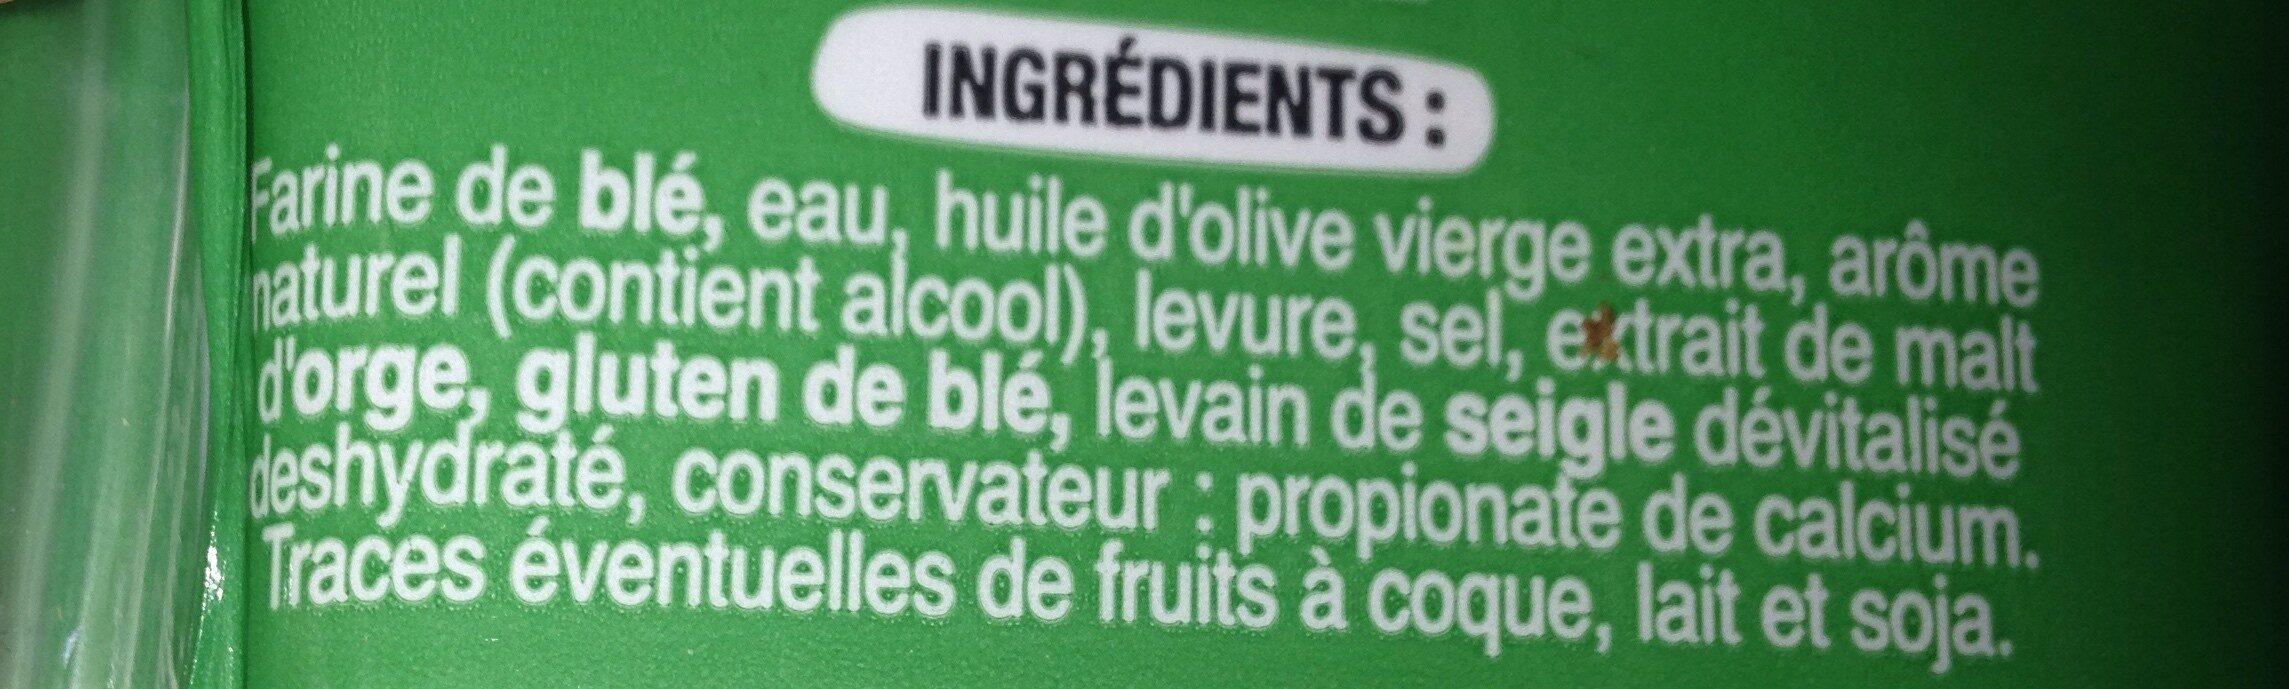 Panini - Ingrédients